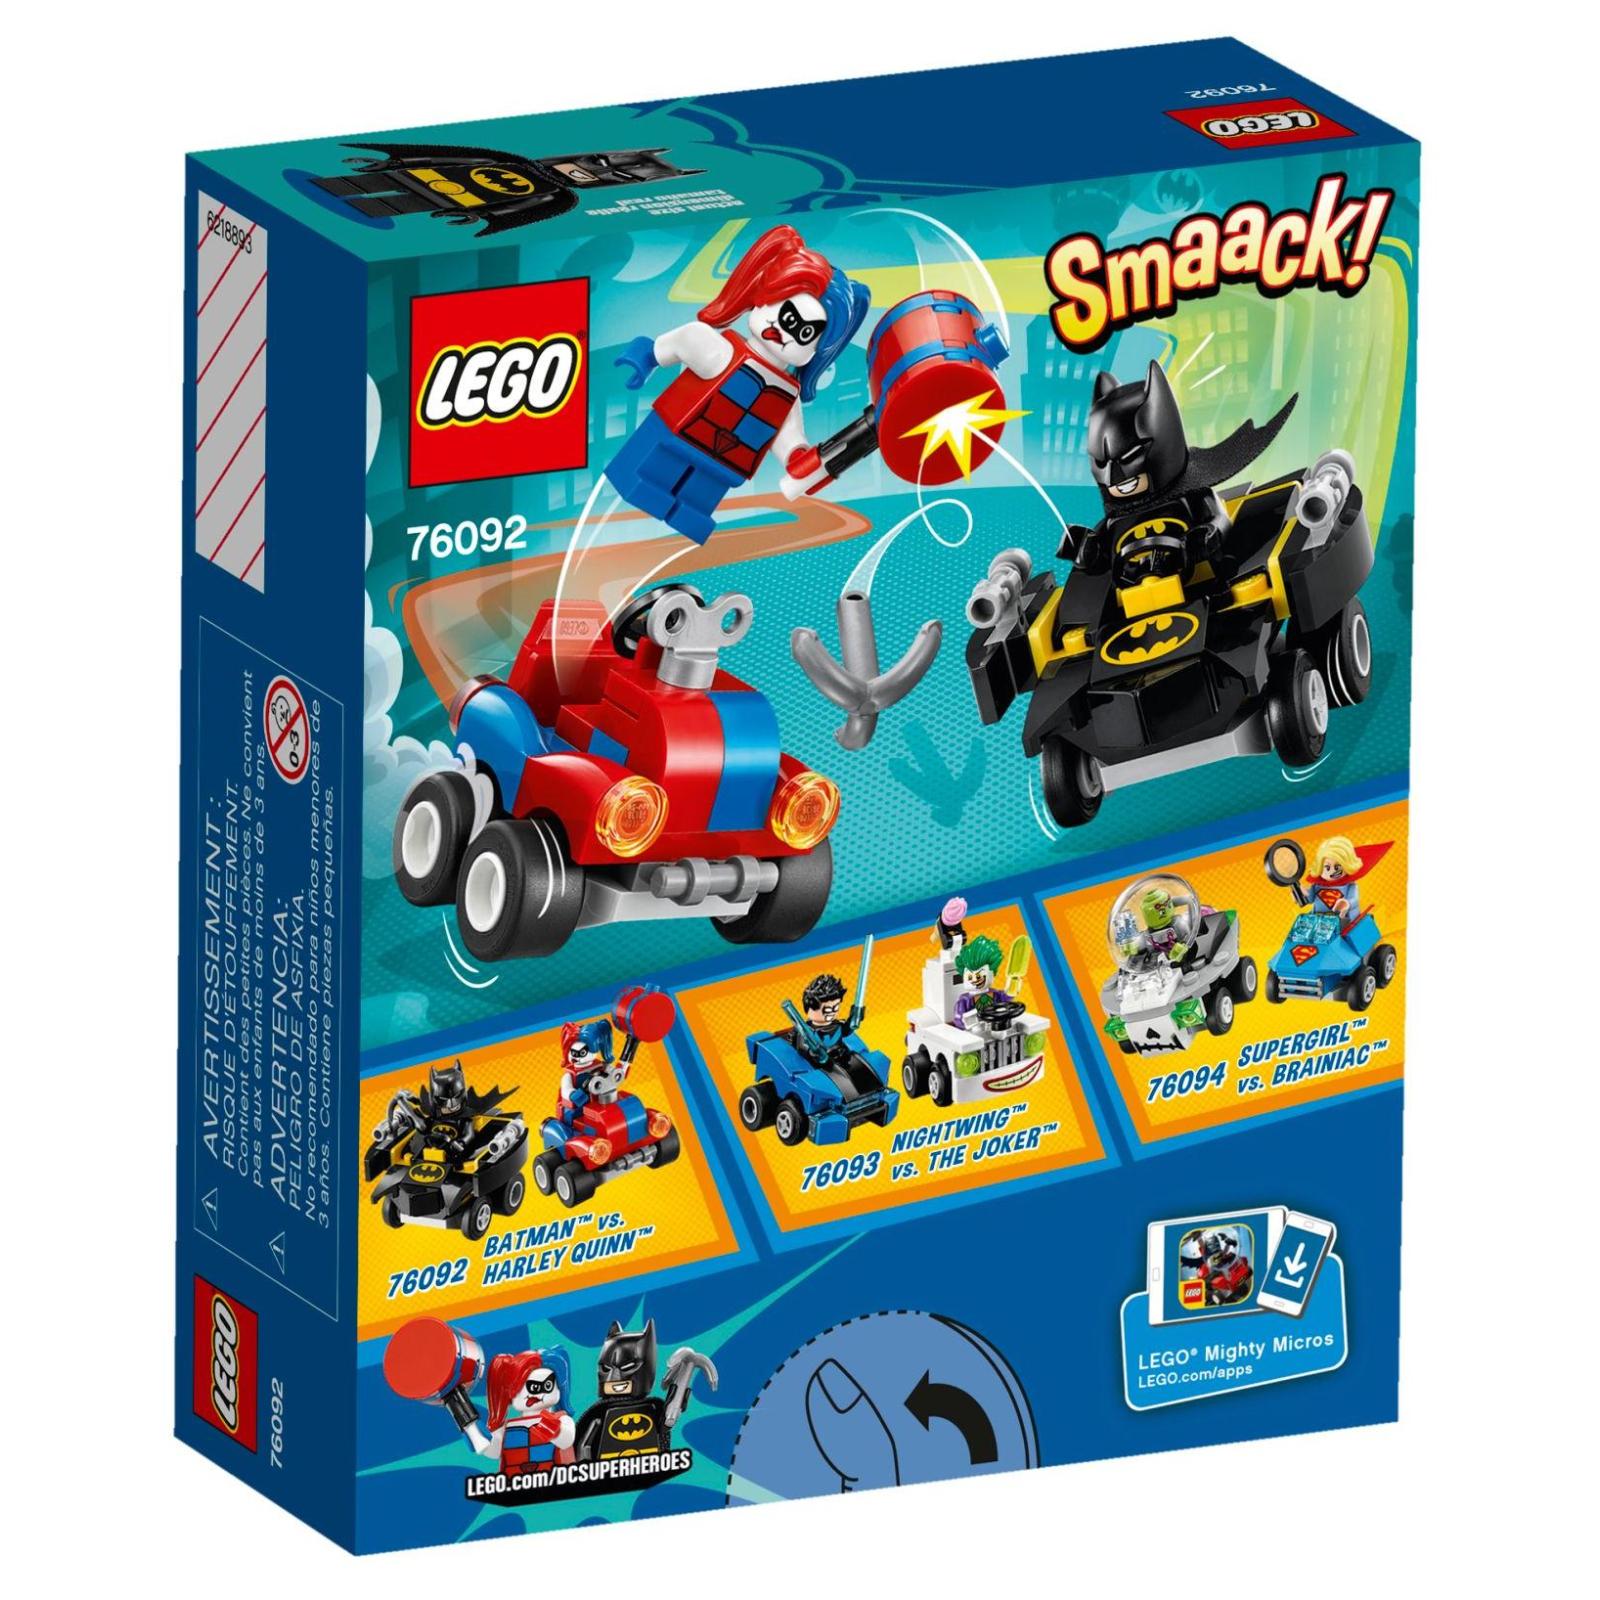 Конструктор LEGO Super Heroes Mighty Micros: Бэтмен против Харли Квин (76092) изображение 7